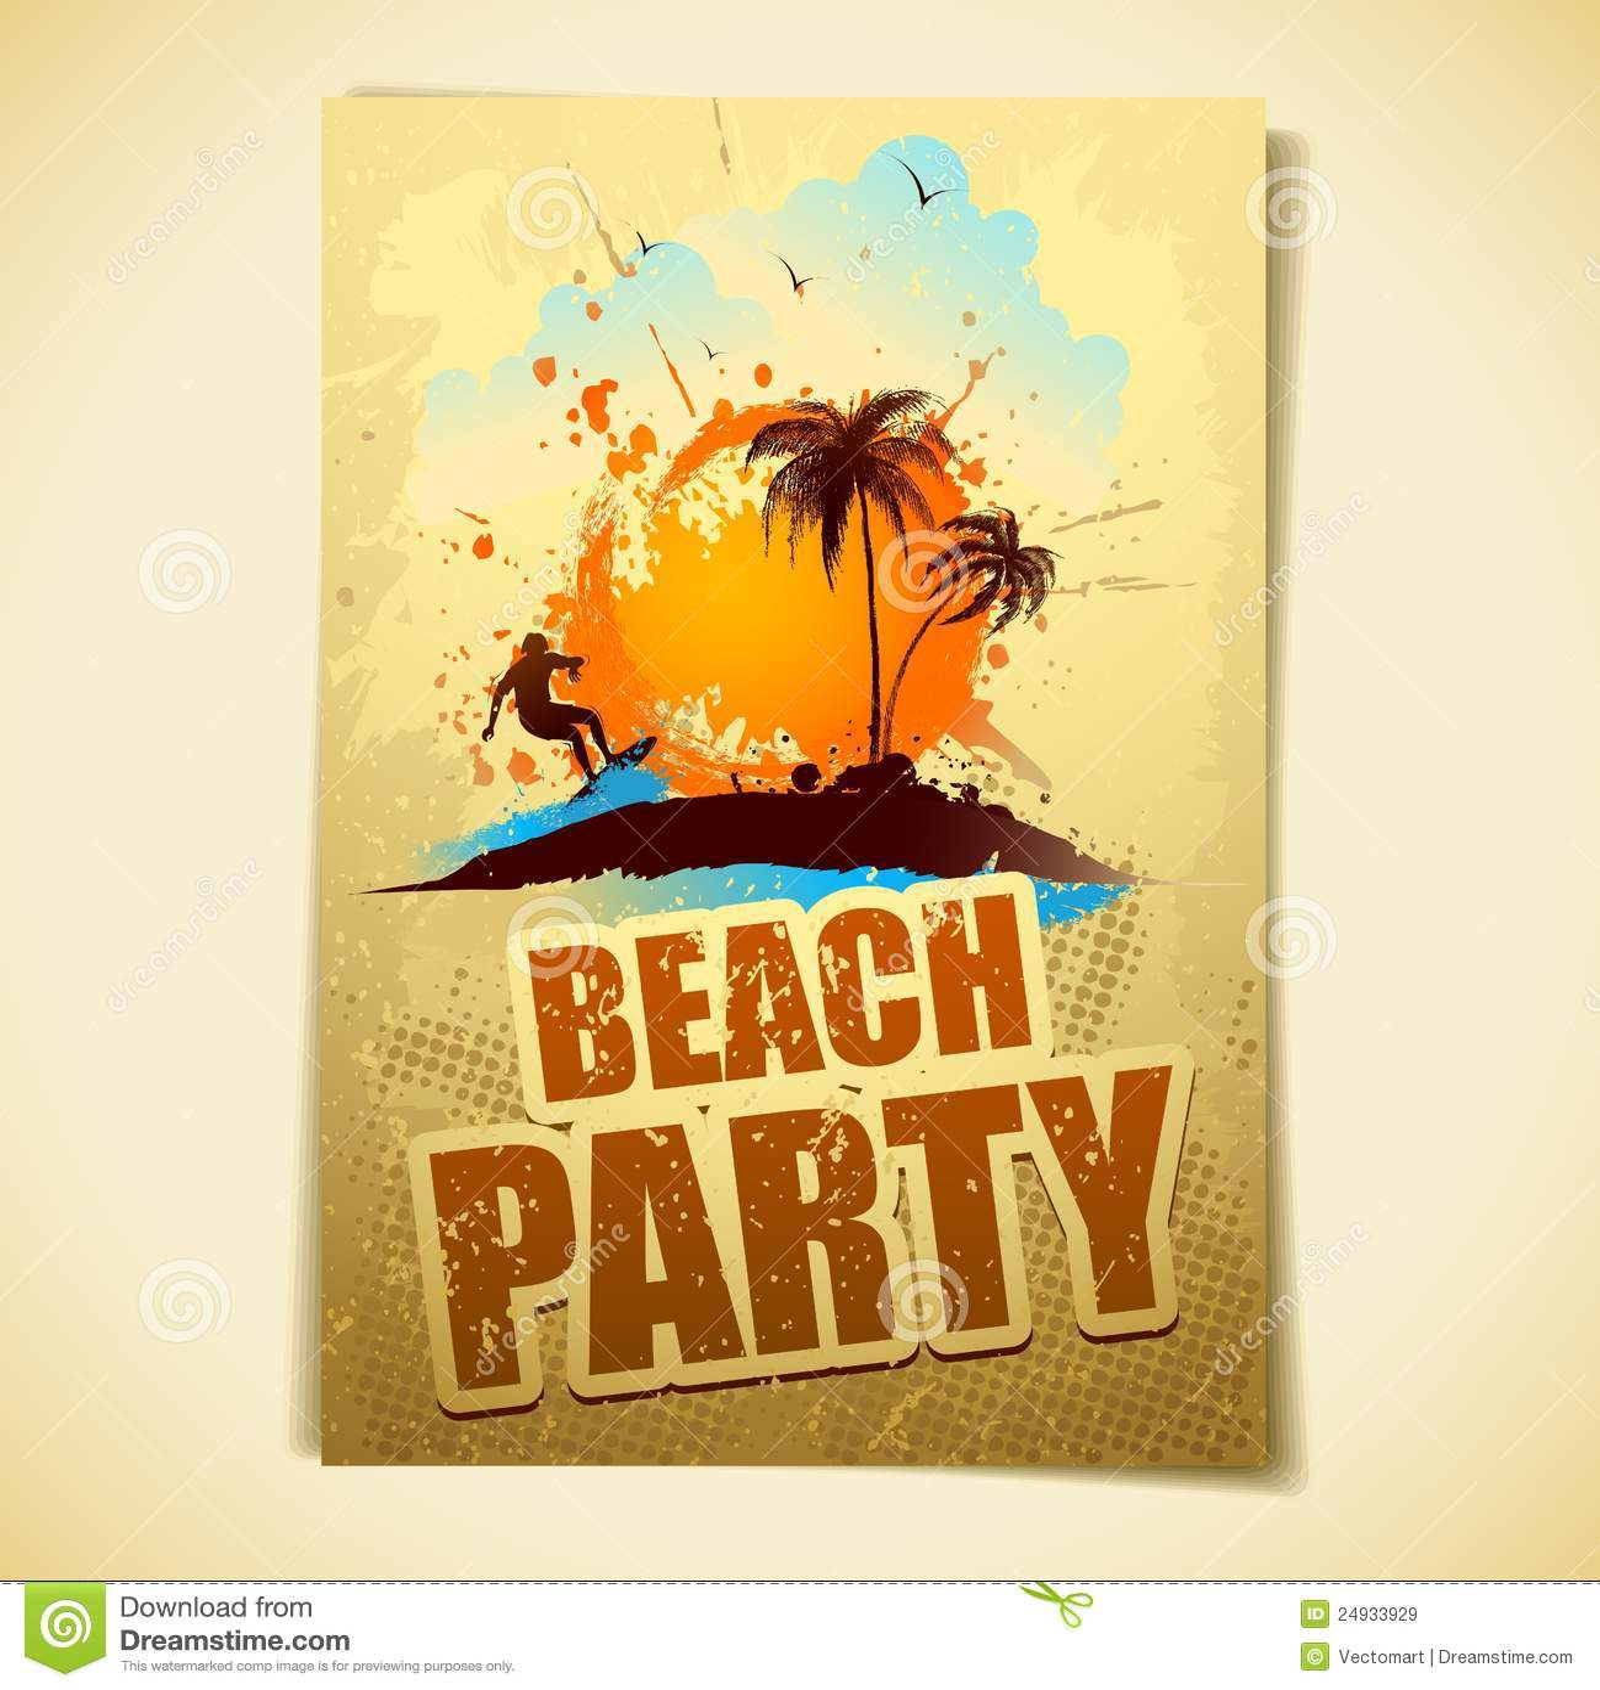 Retro Beach Illustration Royalty Free Stock Photo: Beach Party Stock Vector. Illustration Of Graphic